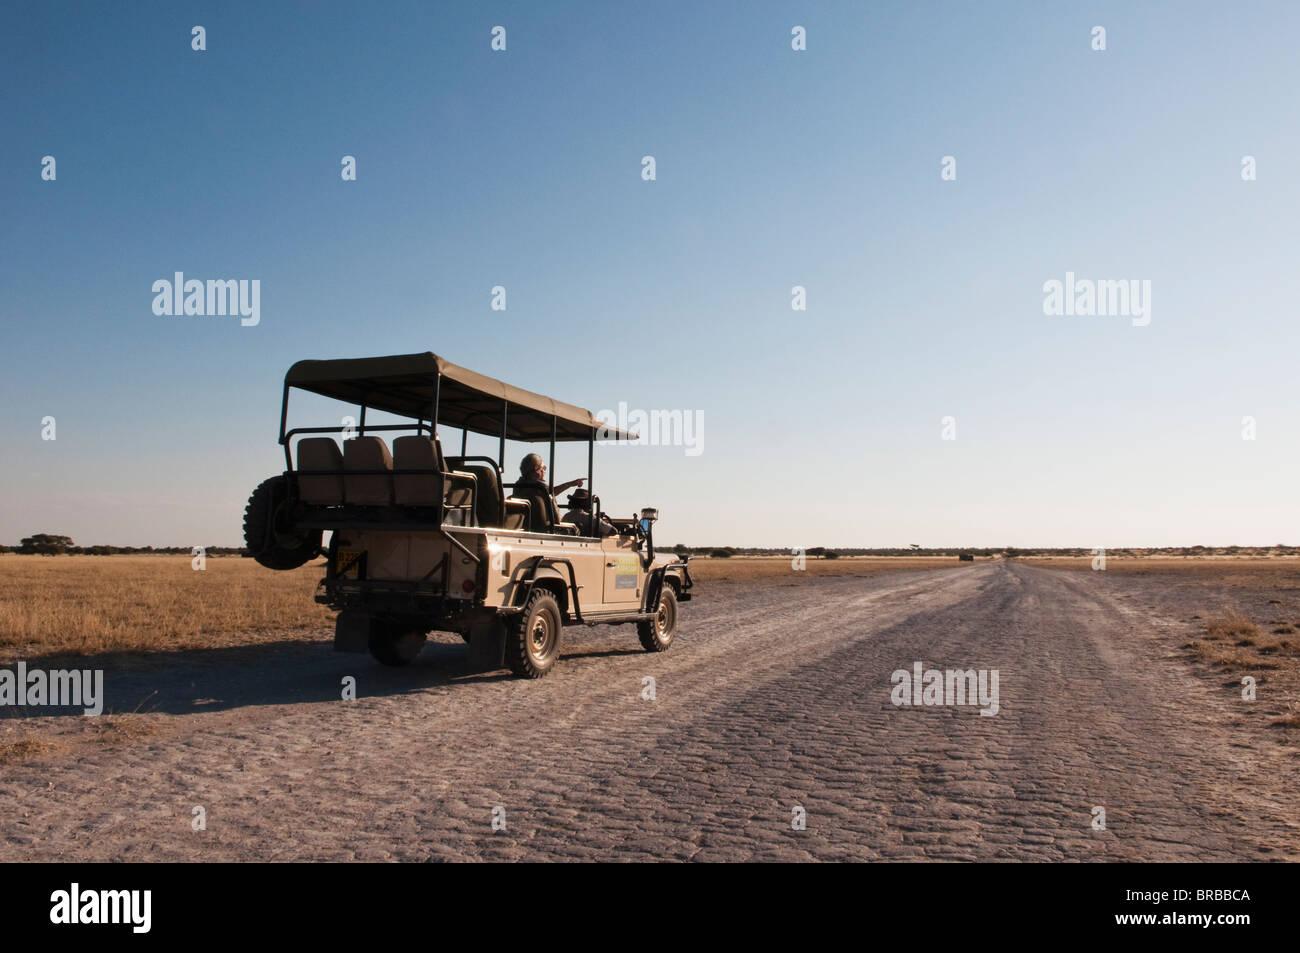 Deception Valley, Central Kalahari Game Reserve, Botswana - Stock Image